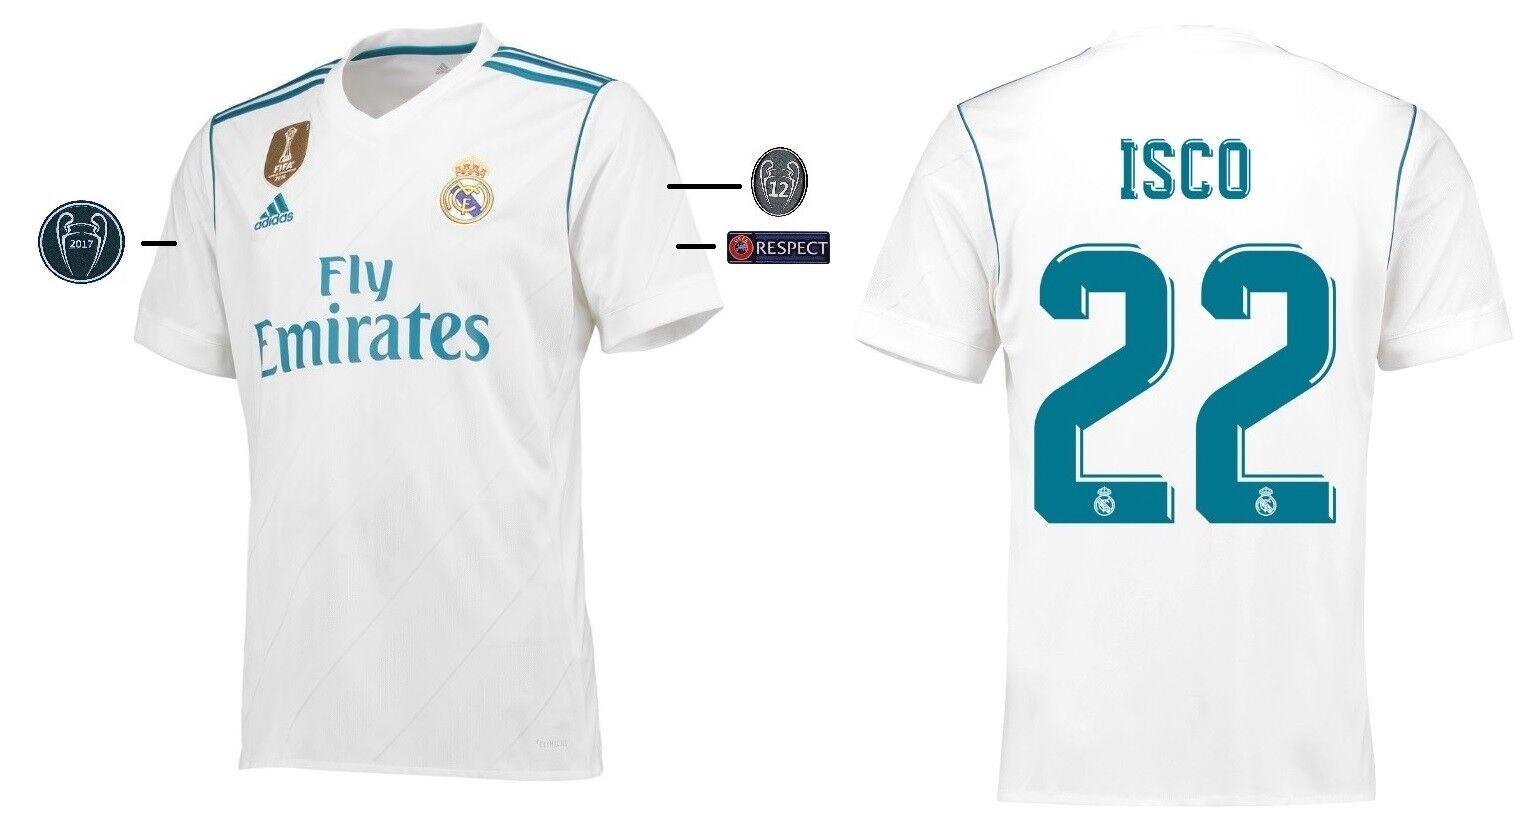 Trikot Adidas Real Madrid 2017-2018 Home UCL - - - Isco 22 73c0e3